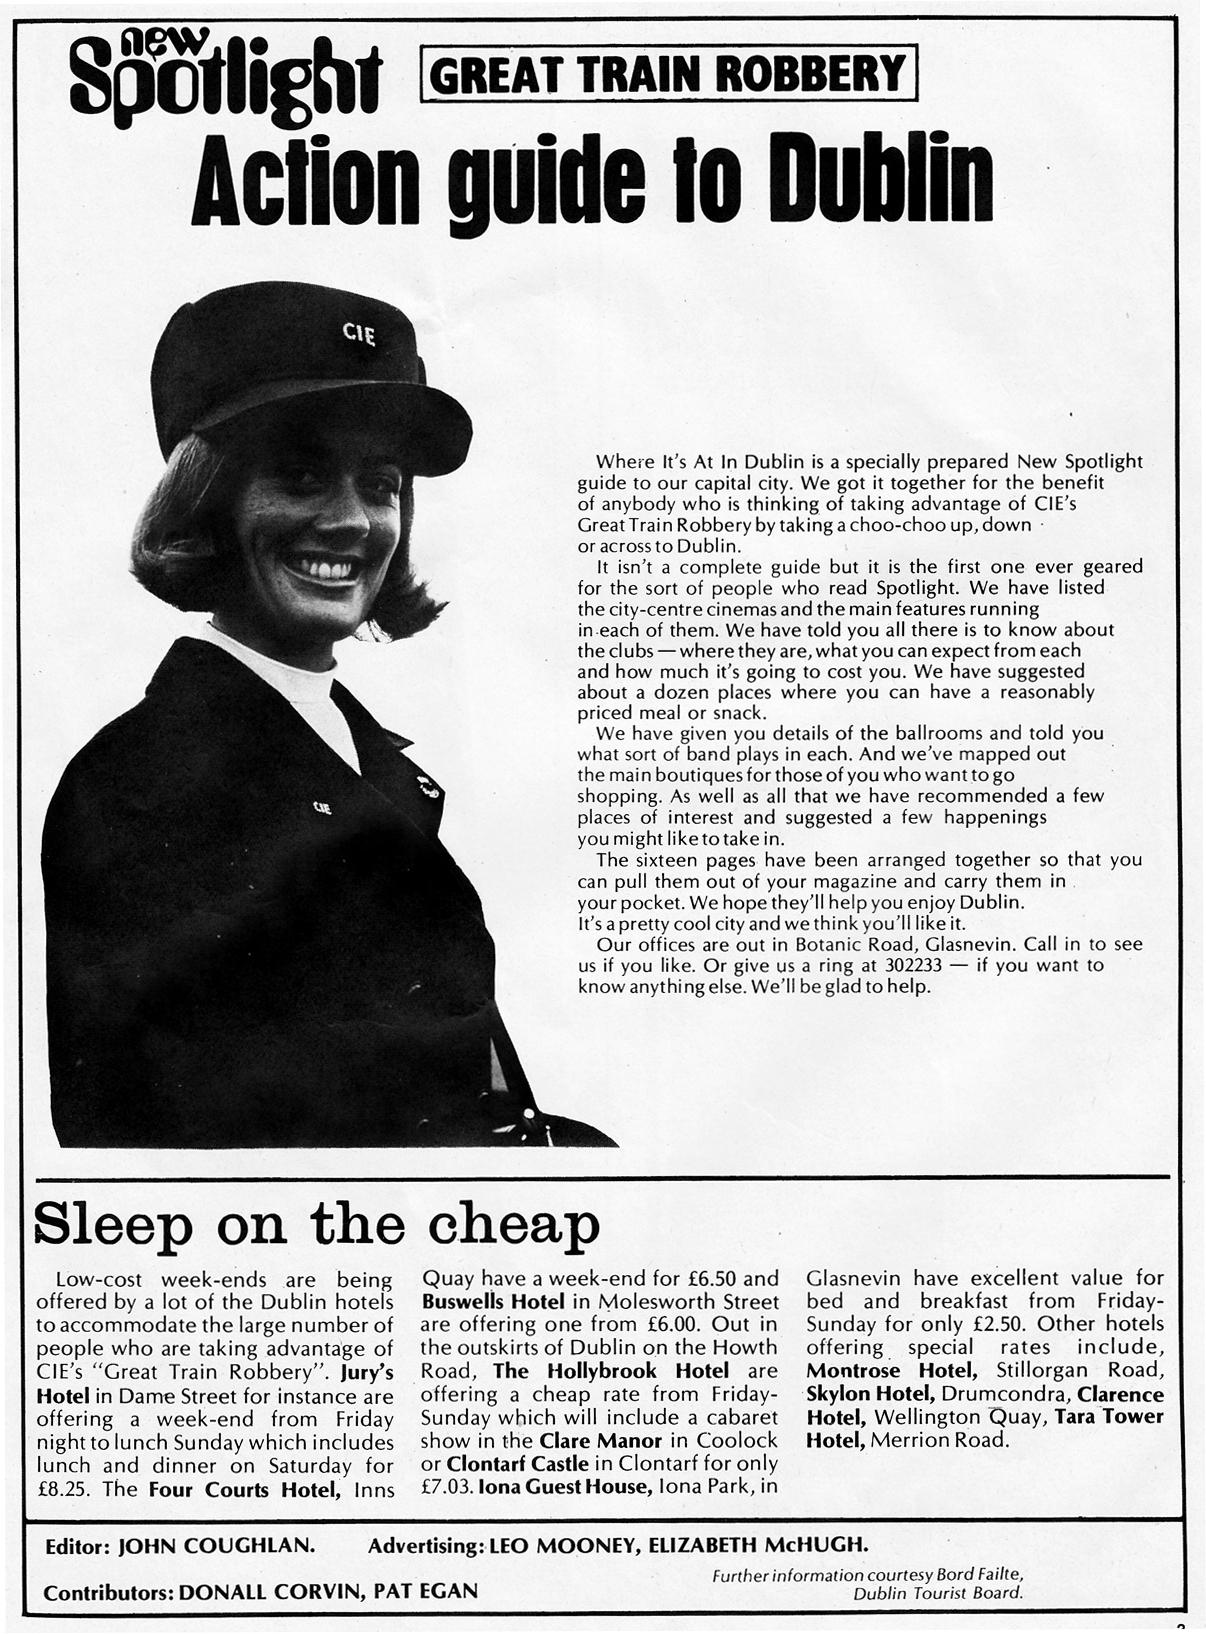 cie-great train robbery 1972